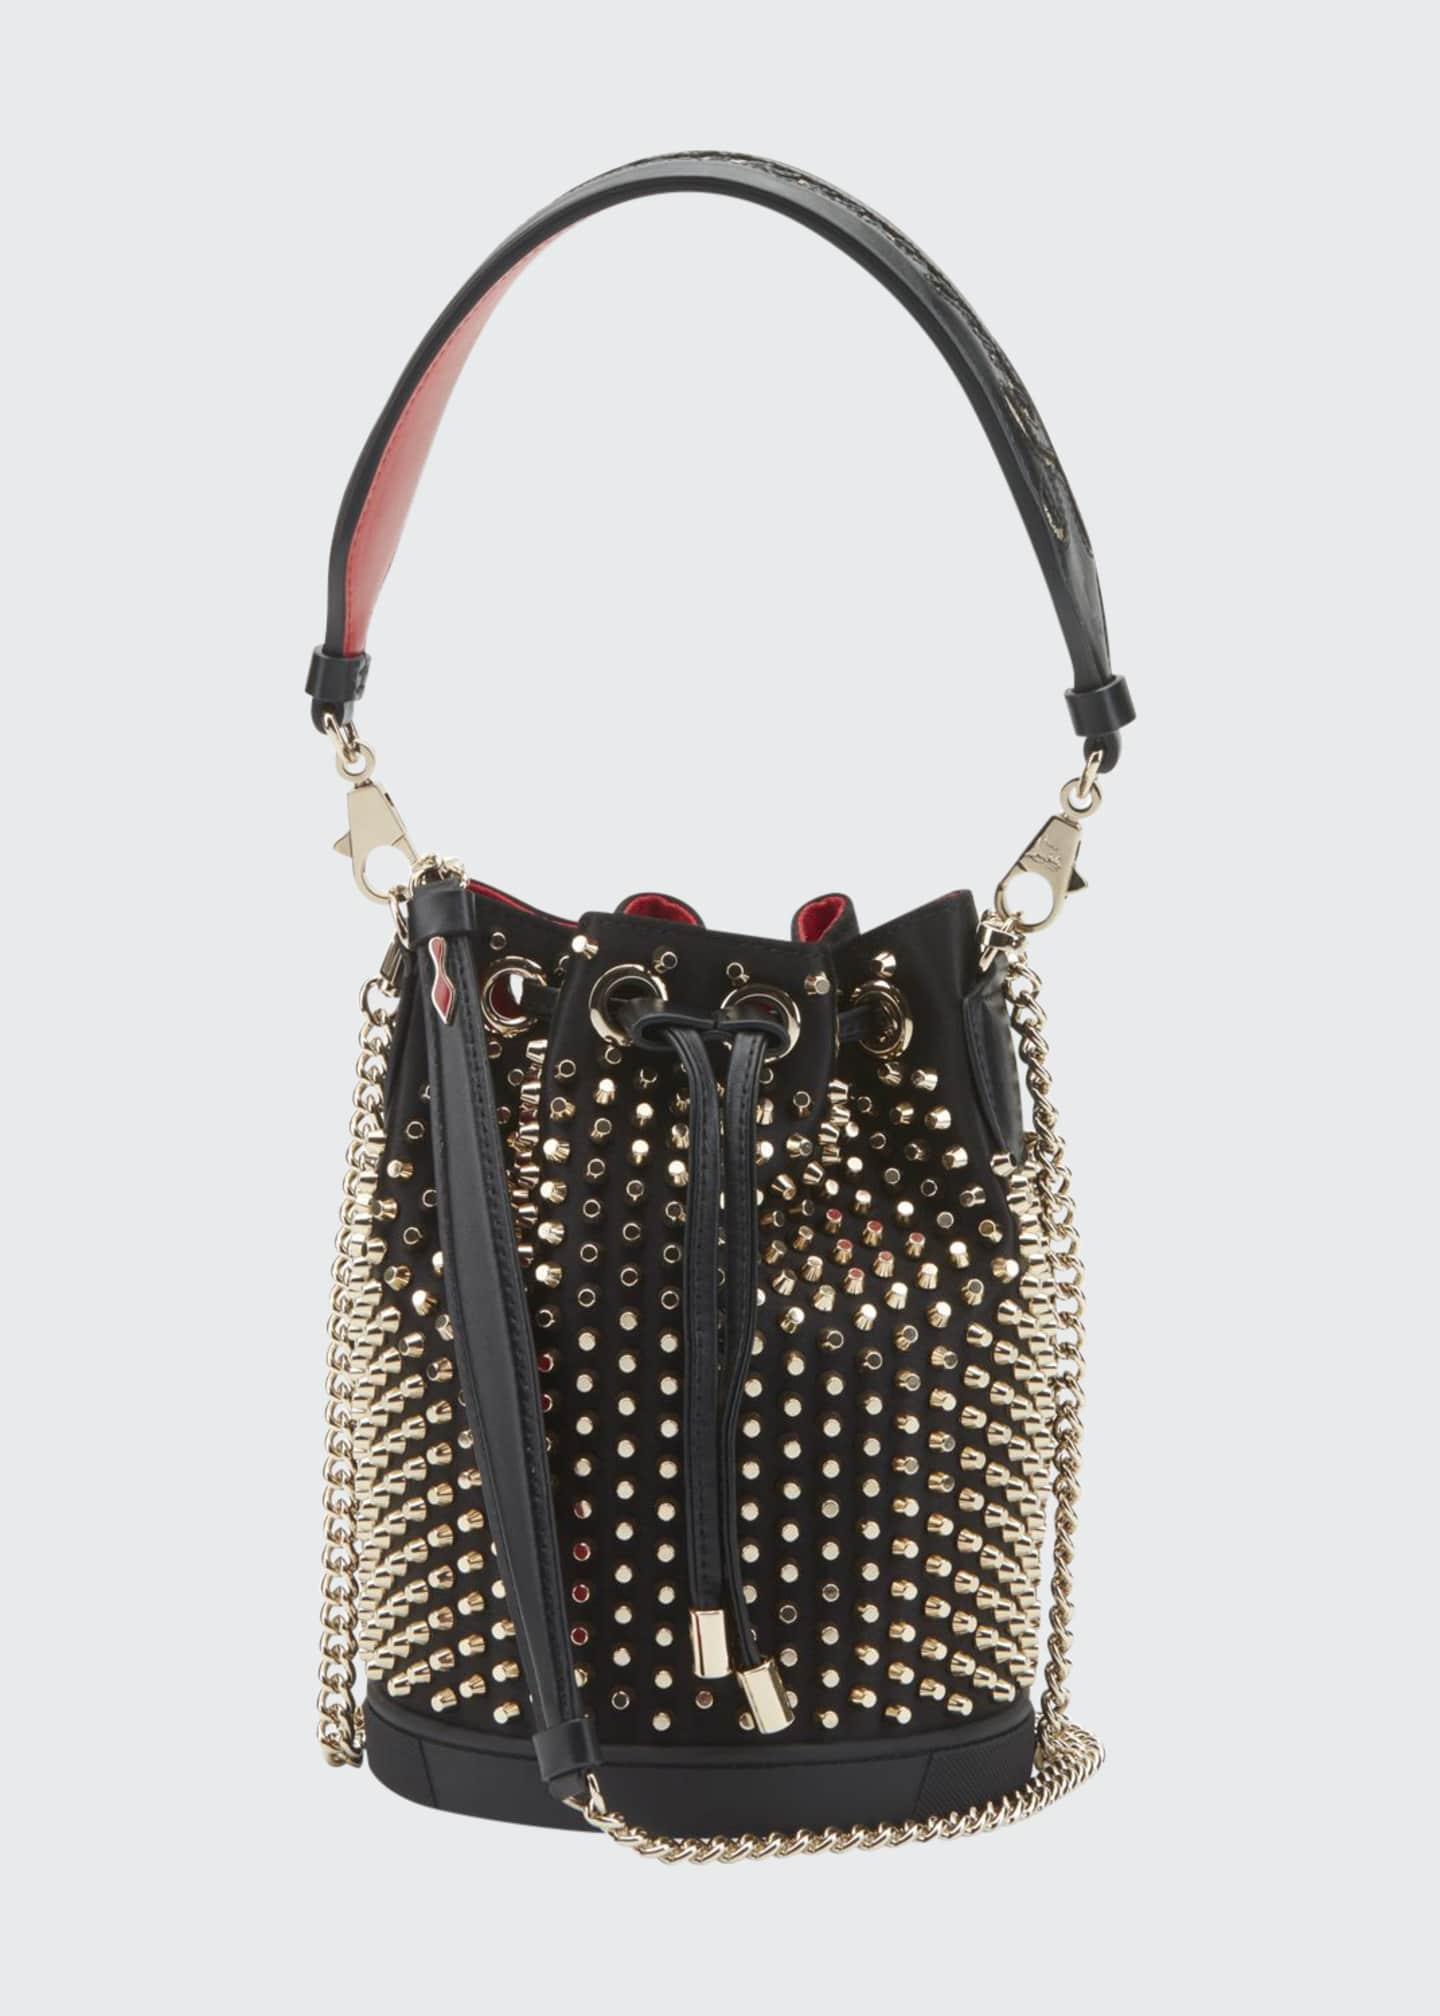 Christian Louboutin Marie Jane Studded Bucket Bag